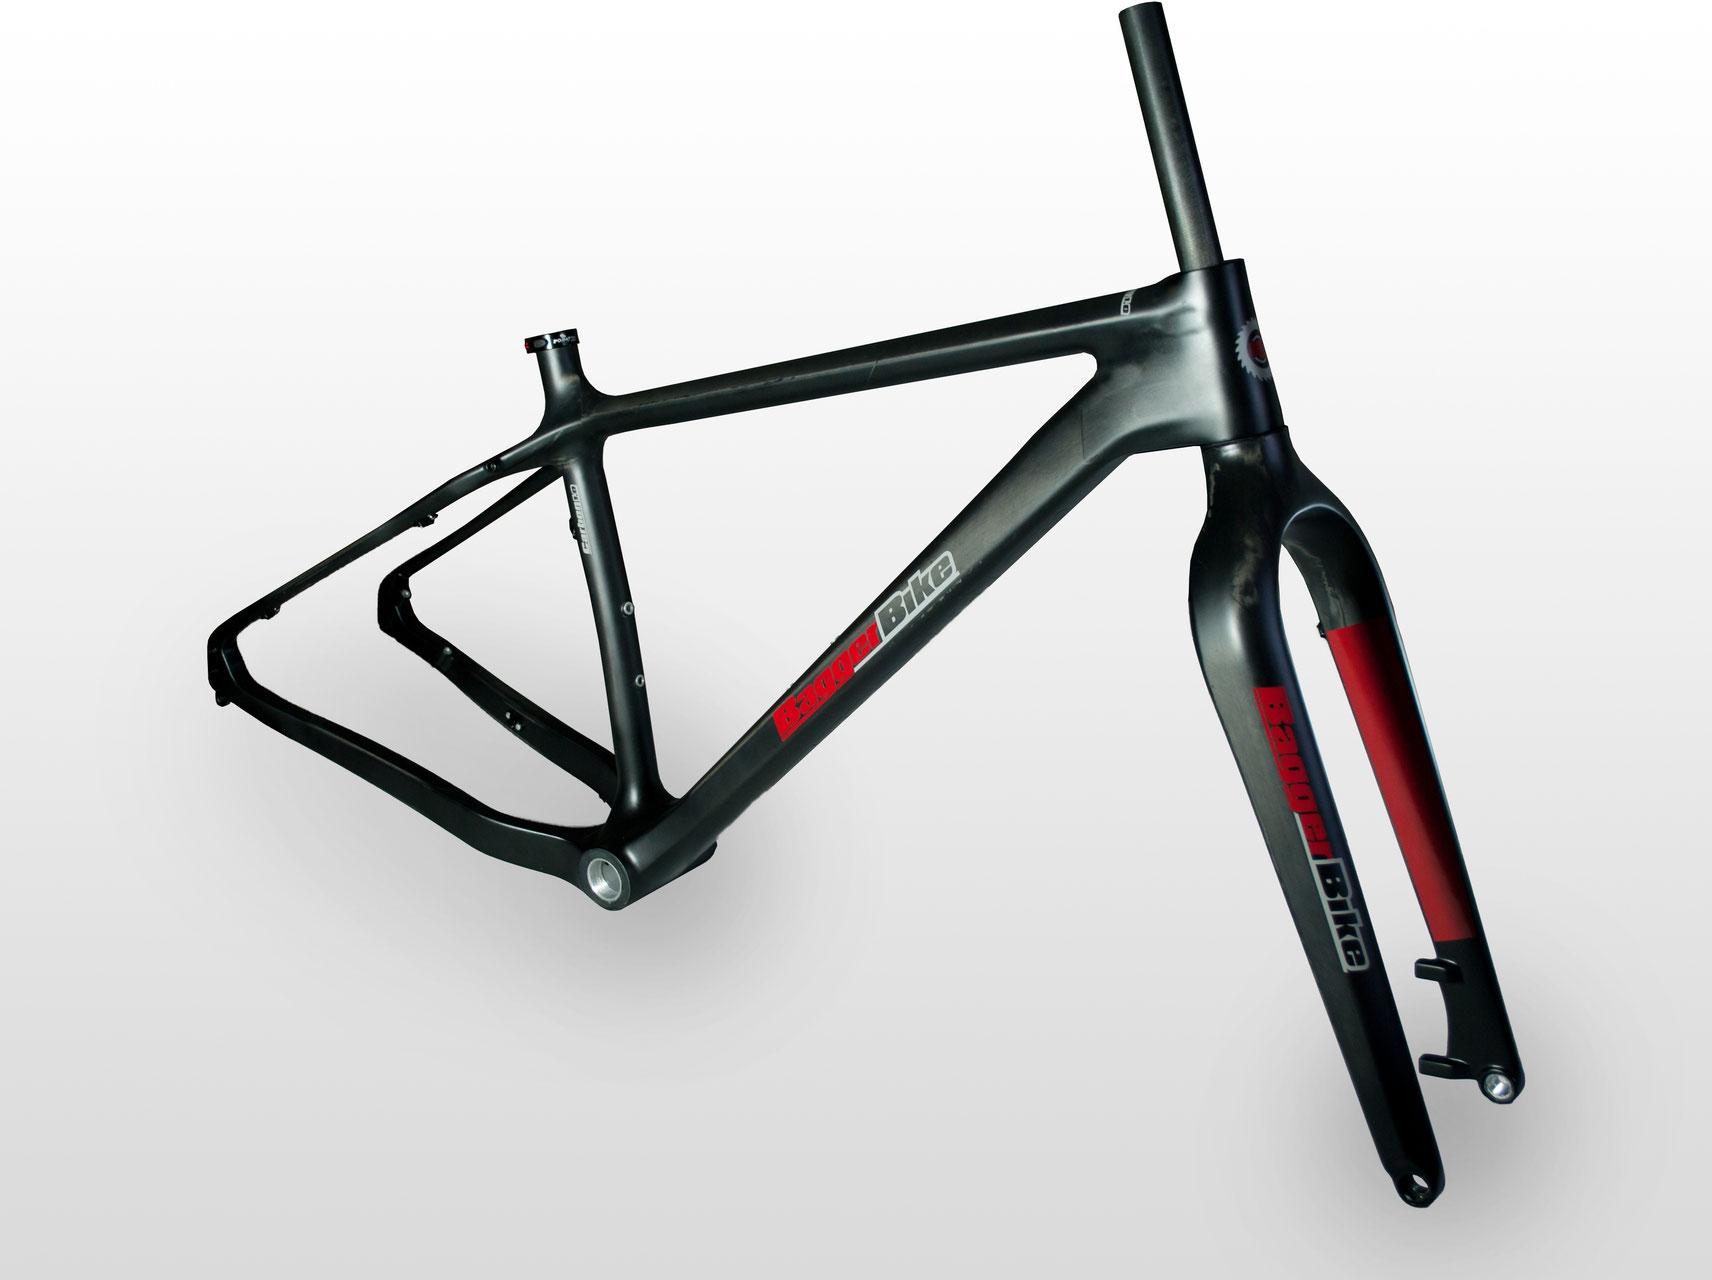 CUADROS FAT BIKE - Baggerbike | Todo para tu Fat Bike